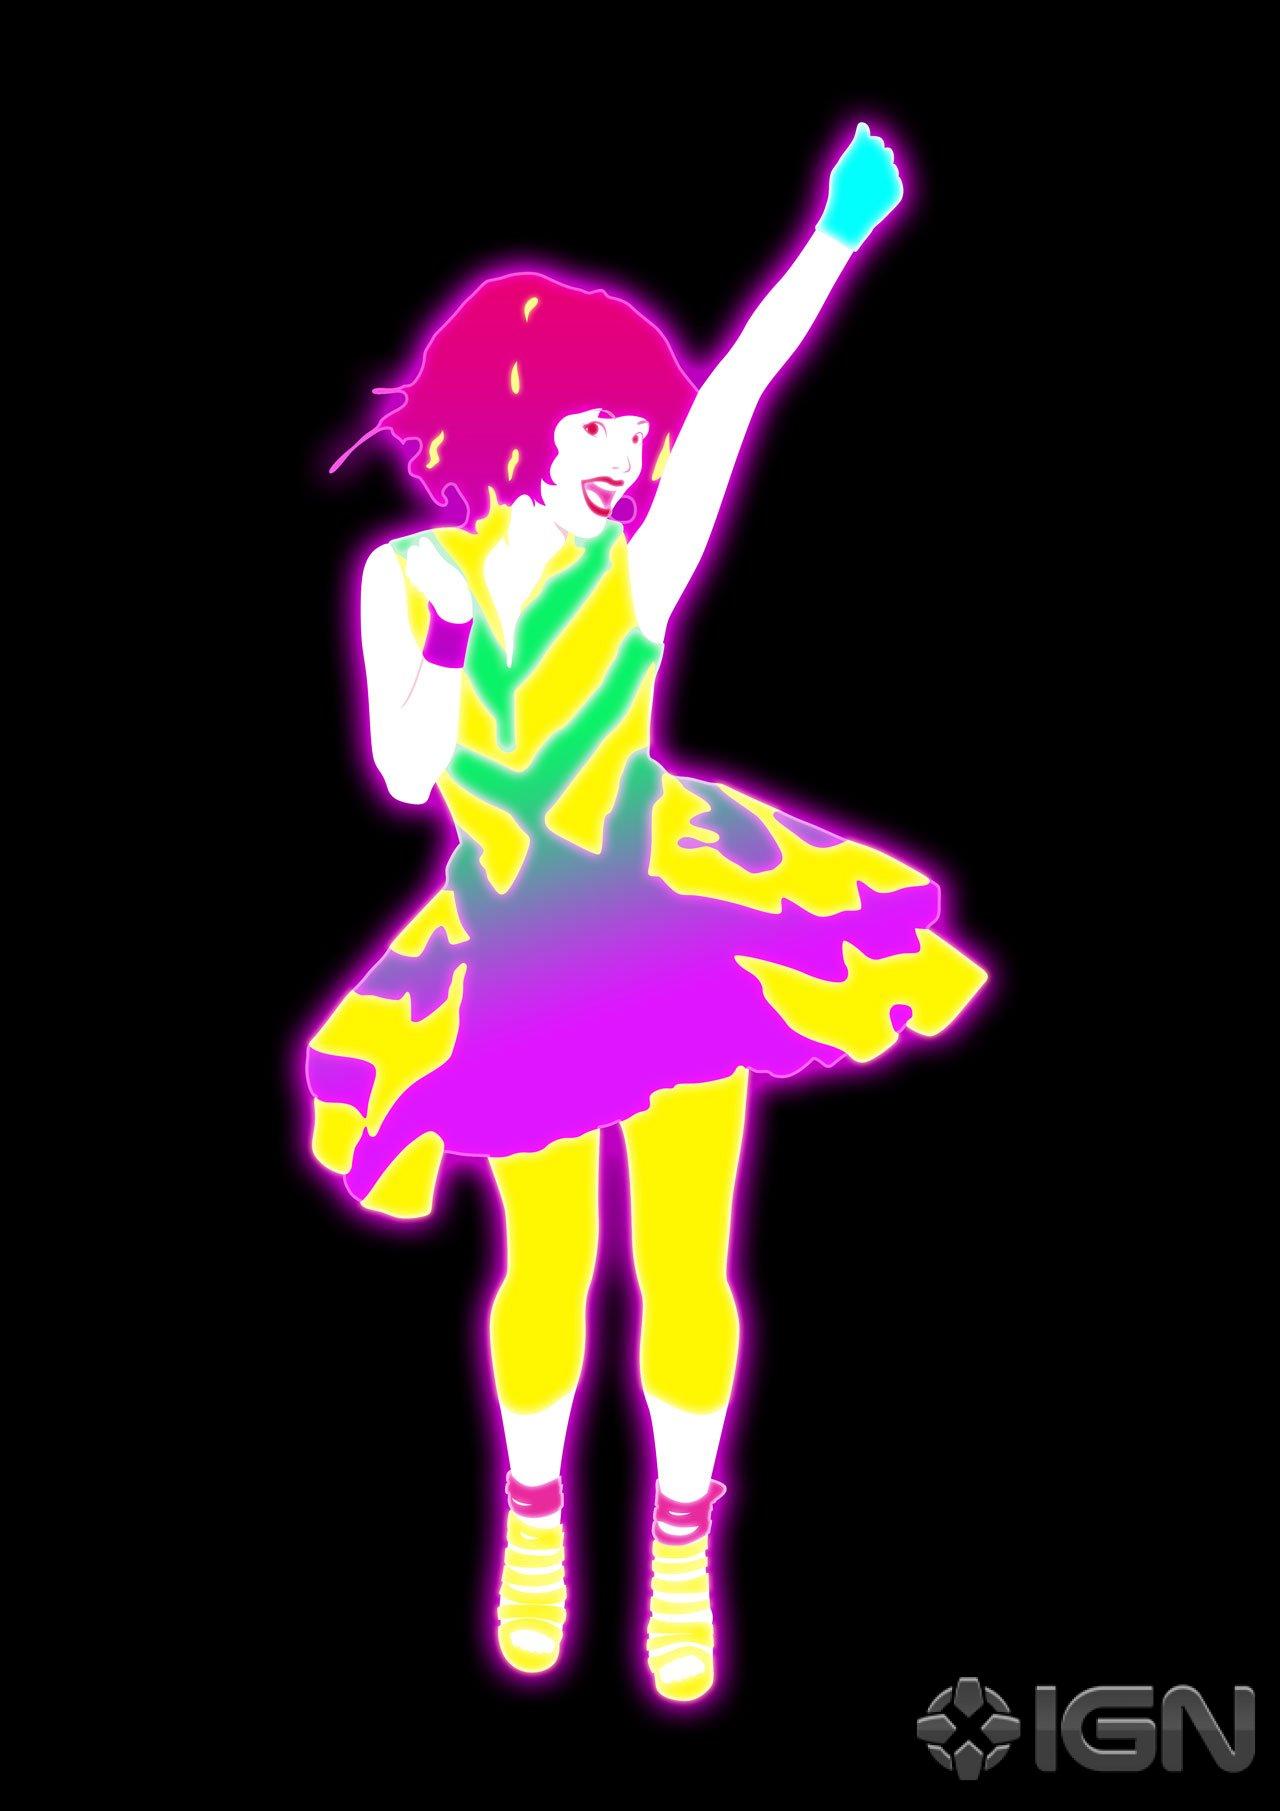 Just Dance 3 Screenshots Pictures Wallpapers   Wii   IGN 1280x1811